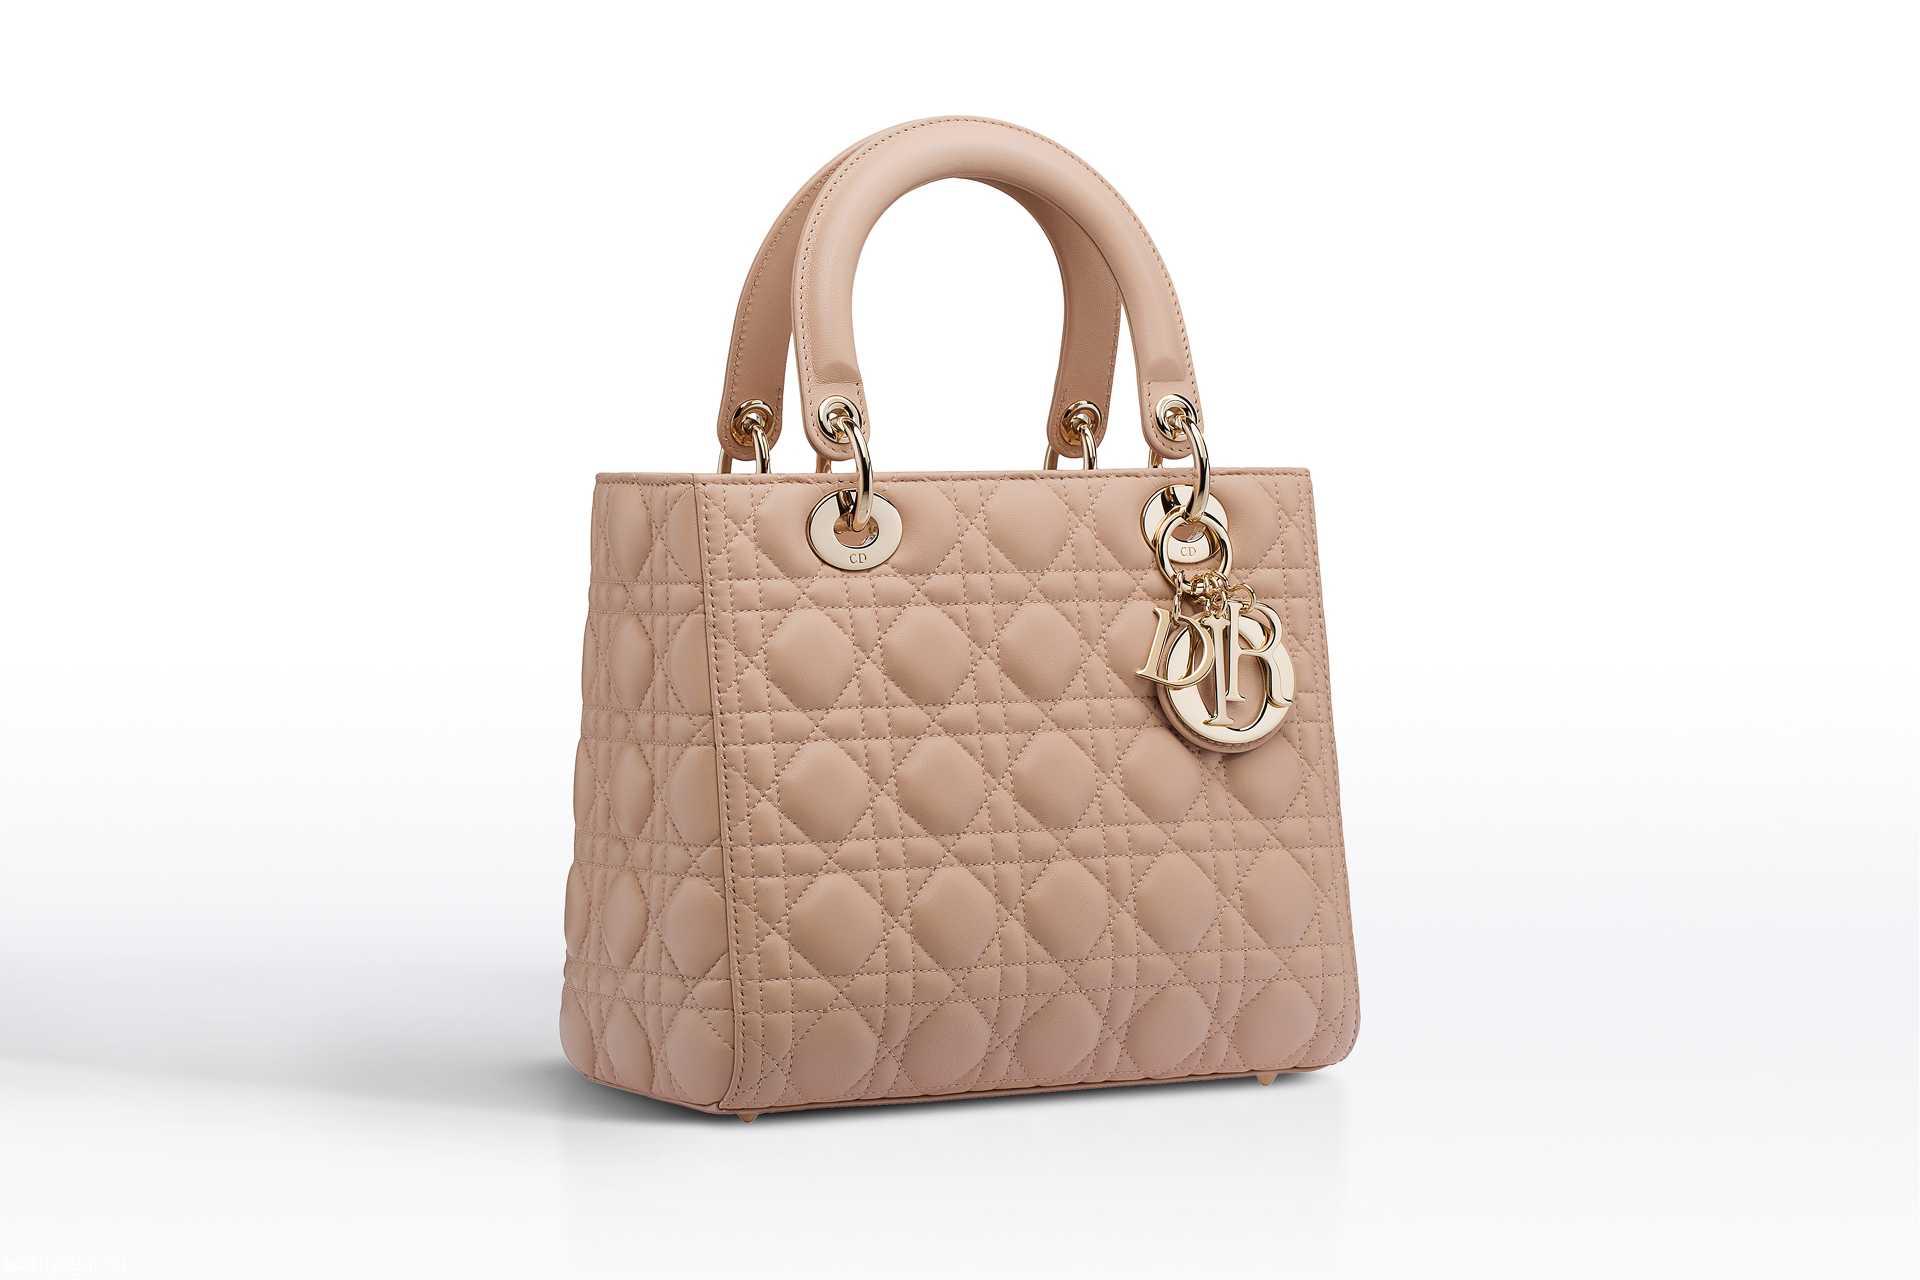 Az ikonikus, kalsszikus Lady Dior